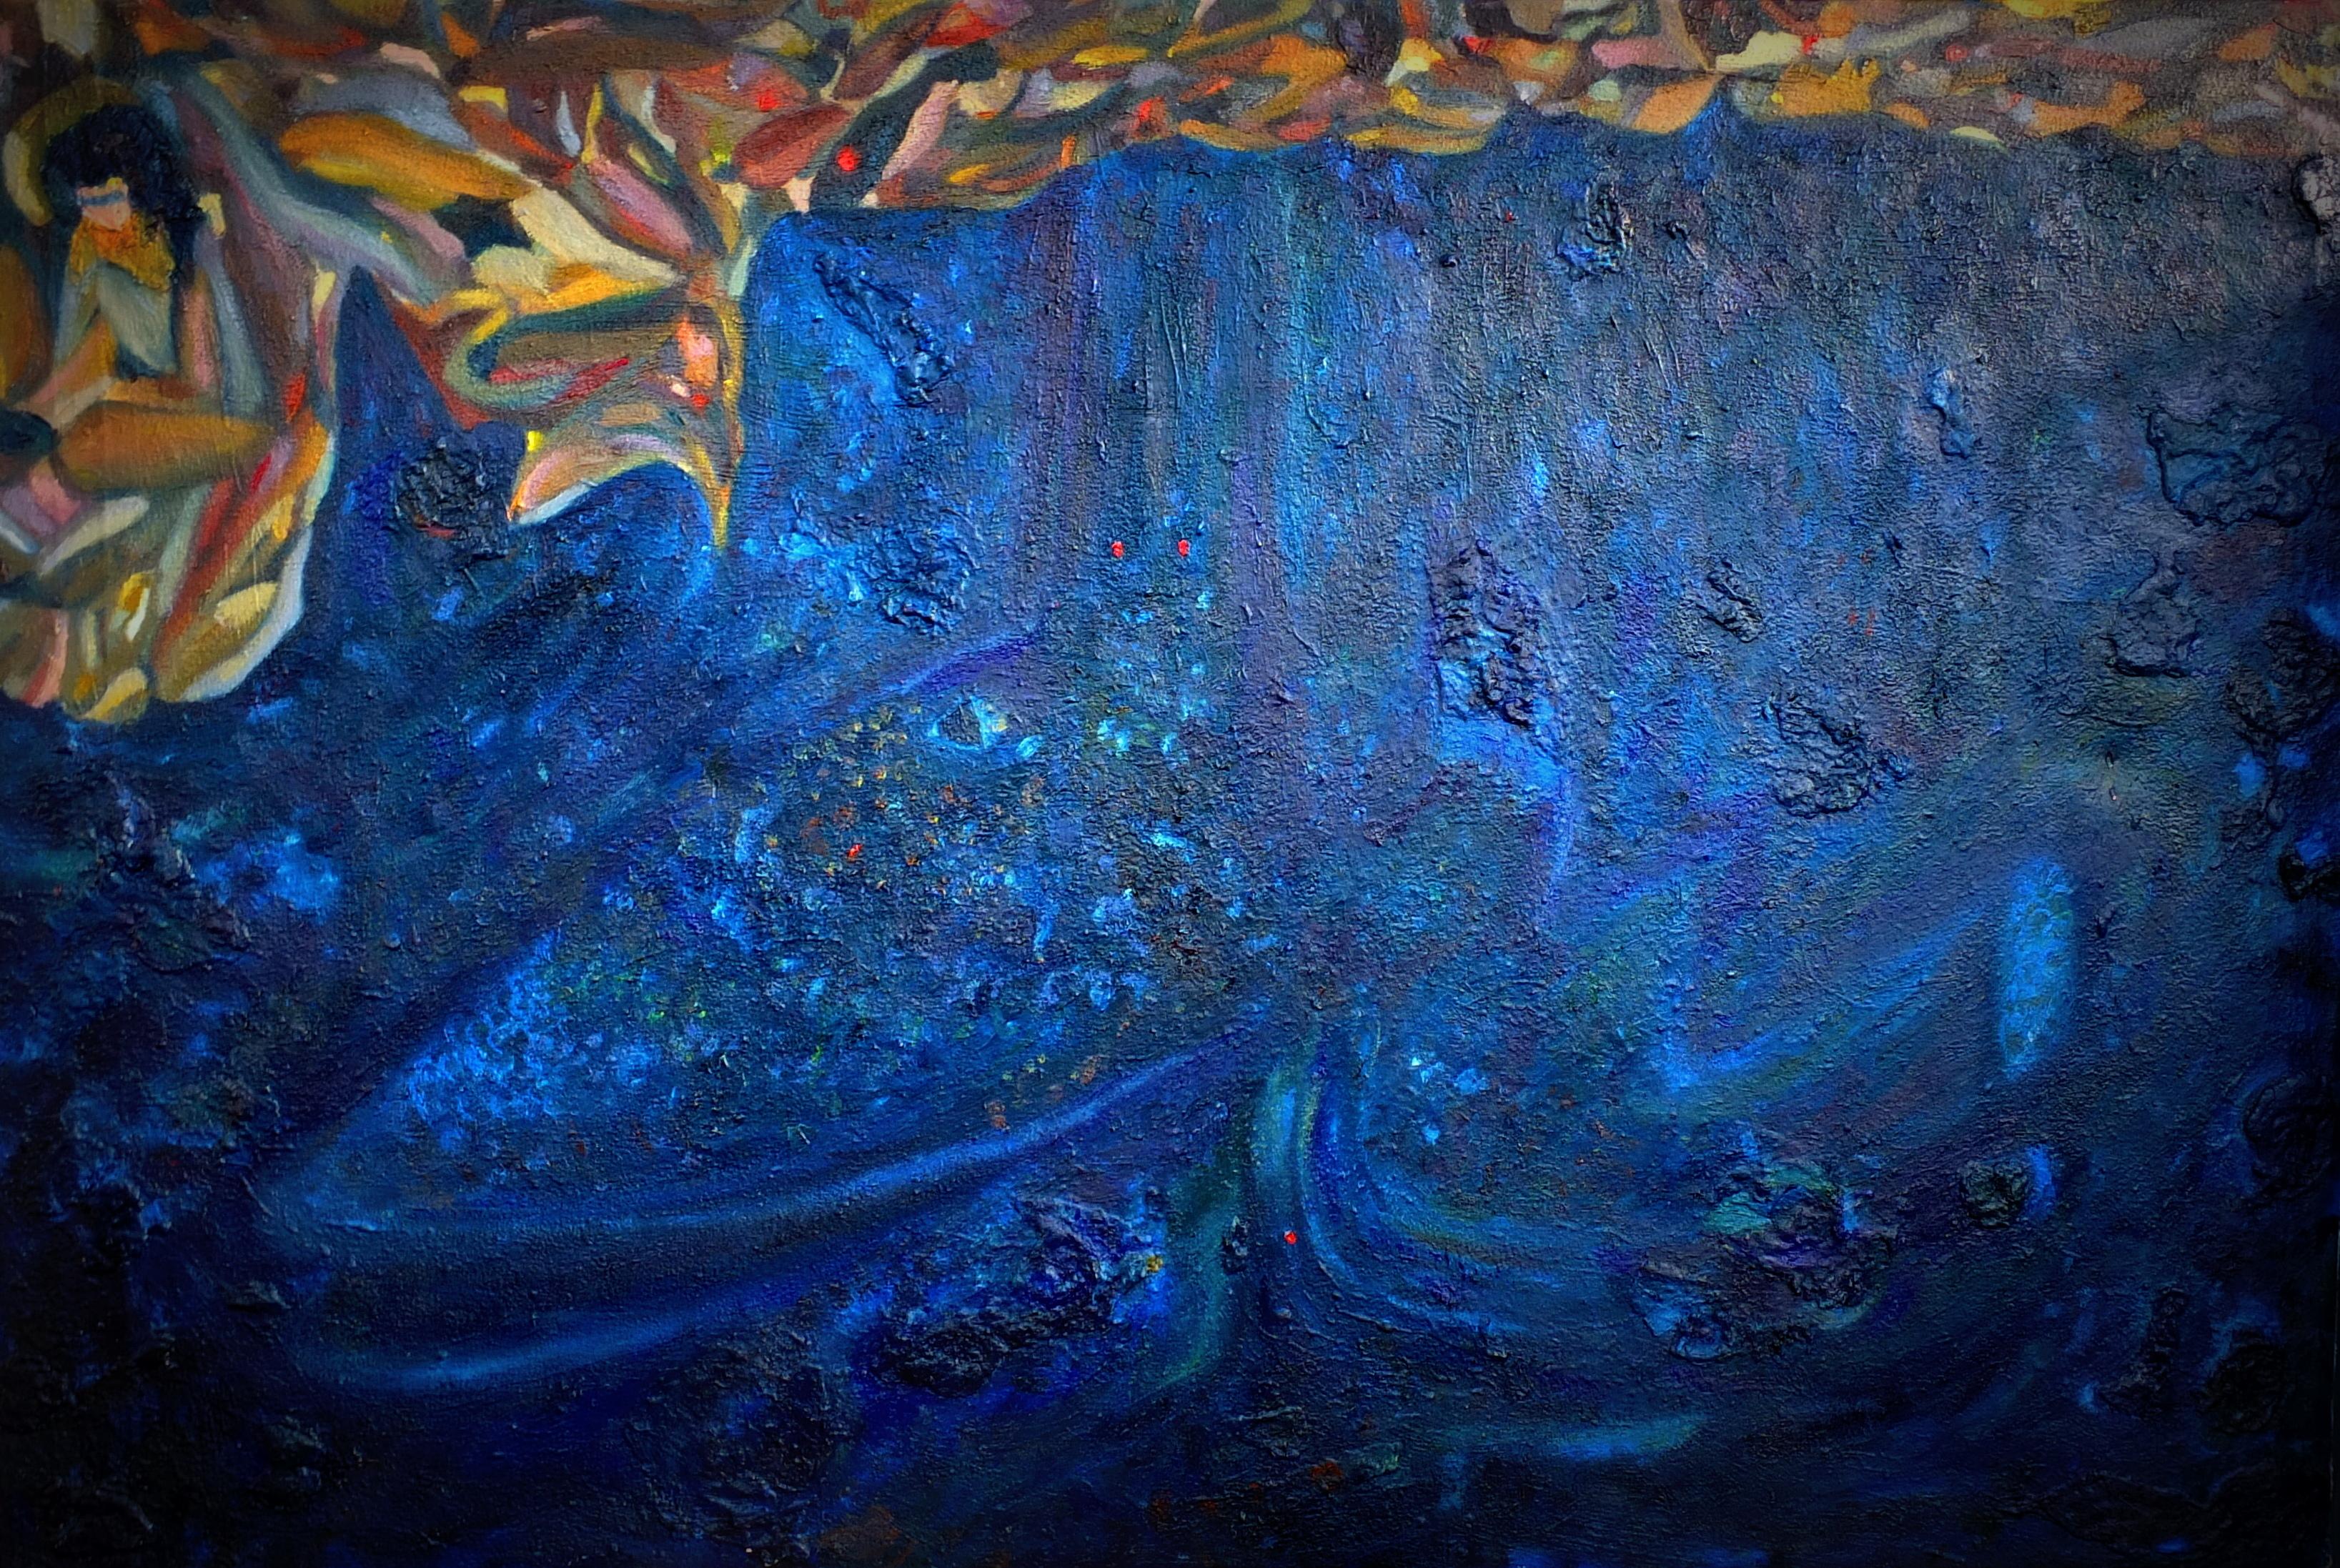 Oily fish II (2012)